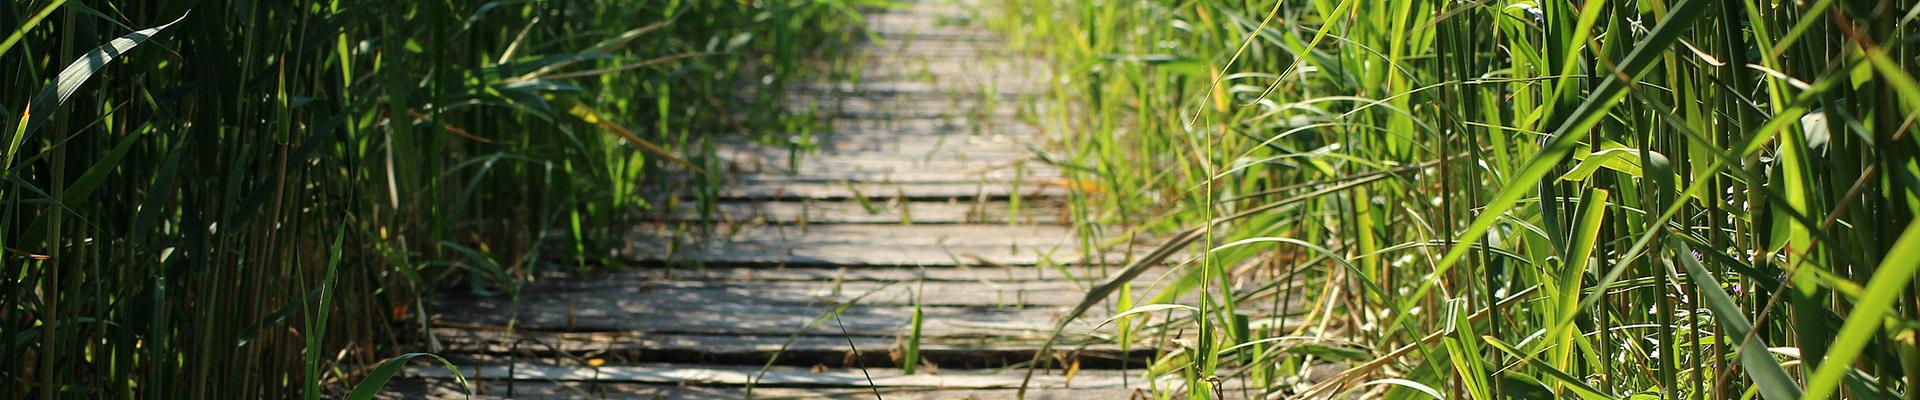 footbridge-3437246 Pixabay